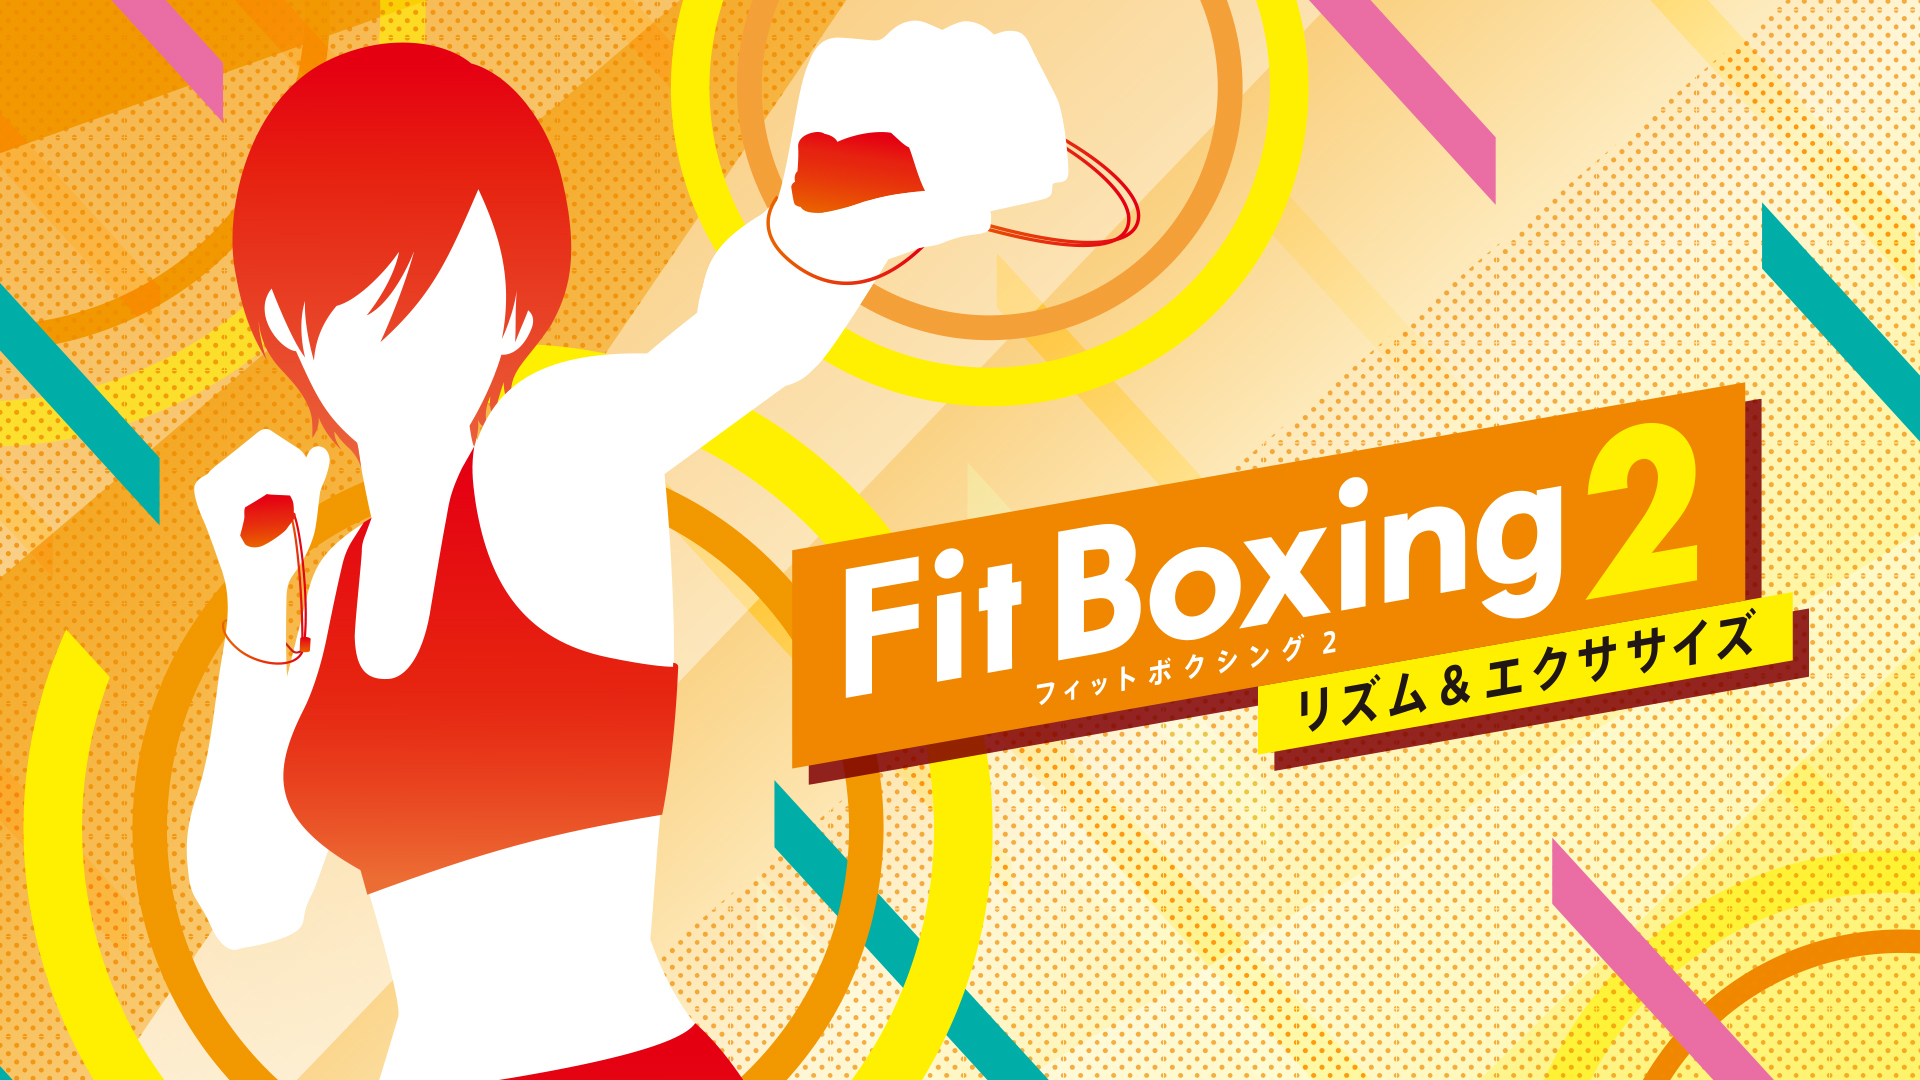 Nintendo Switch ソフト「FitBoxing 2」 (C)Imagineer Co., Ltd.